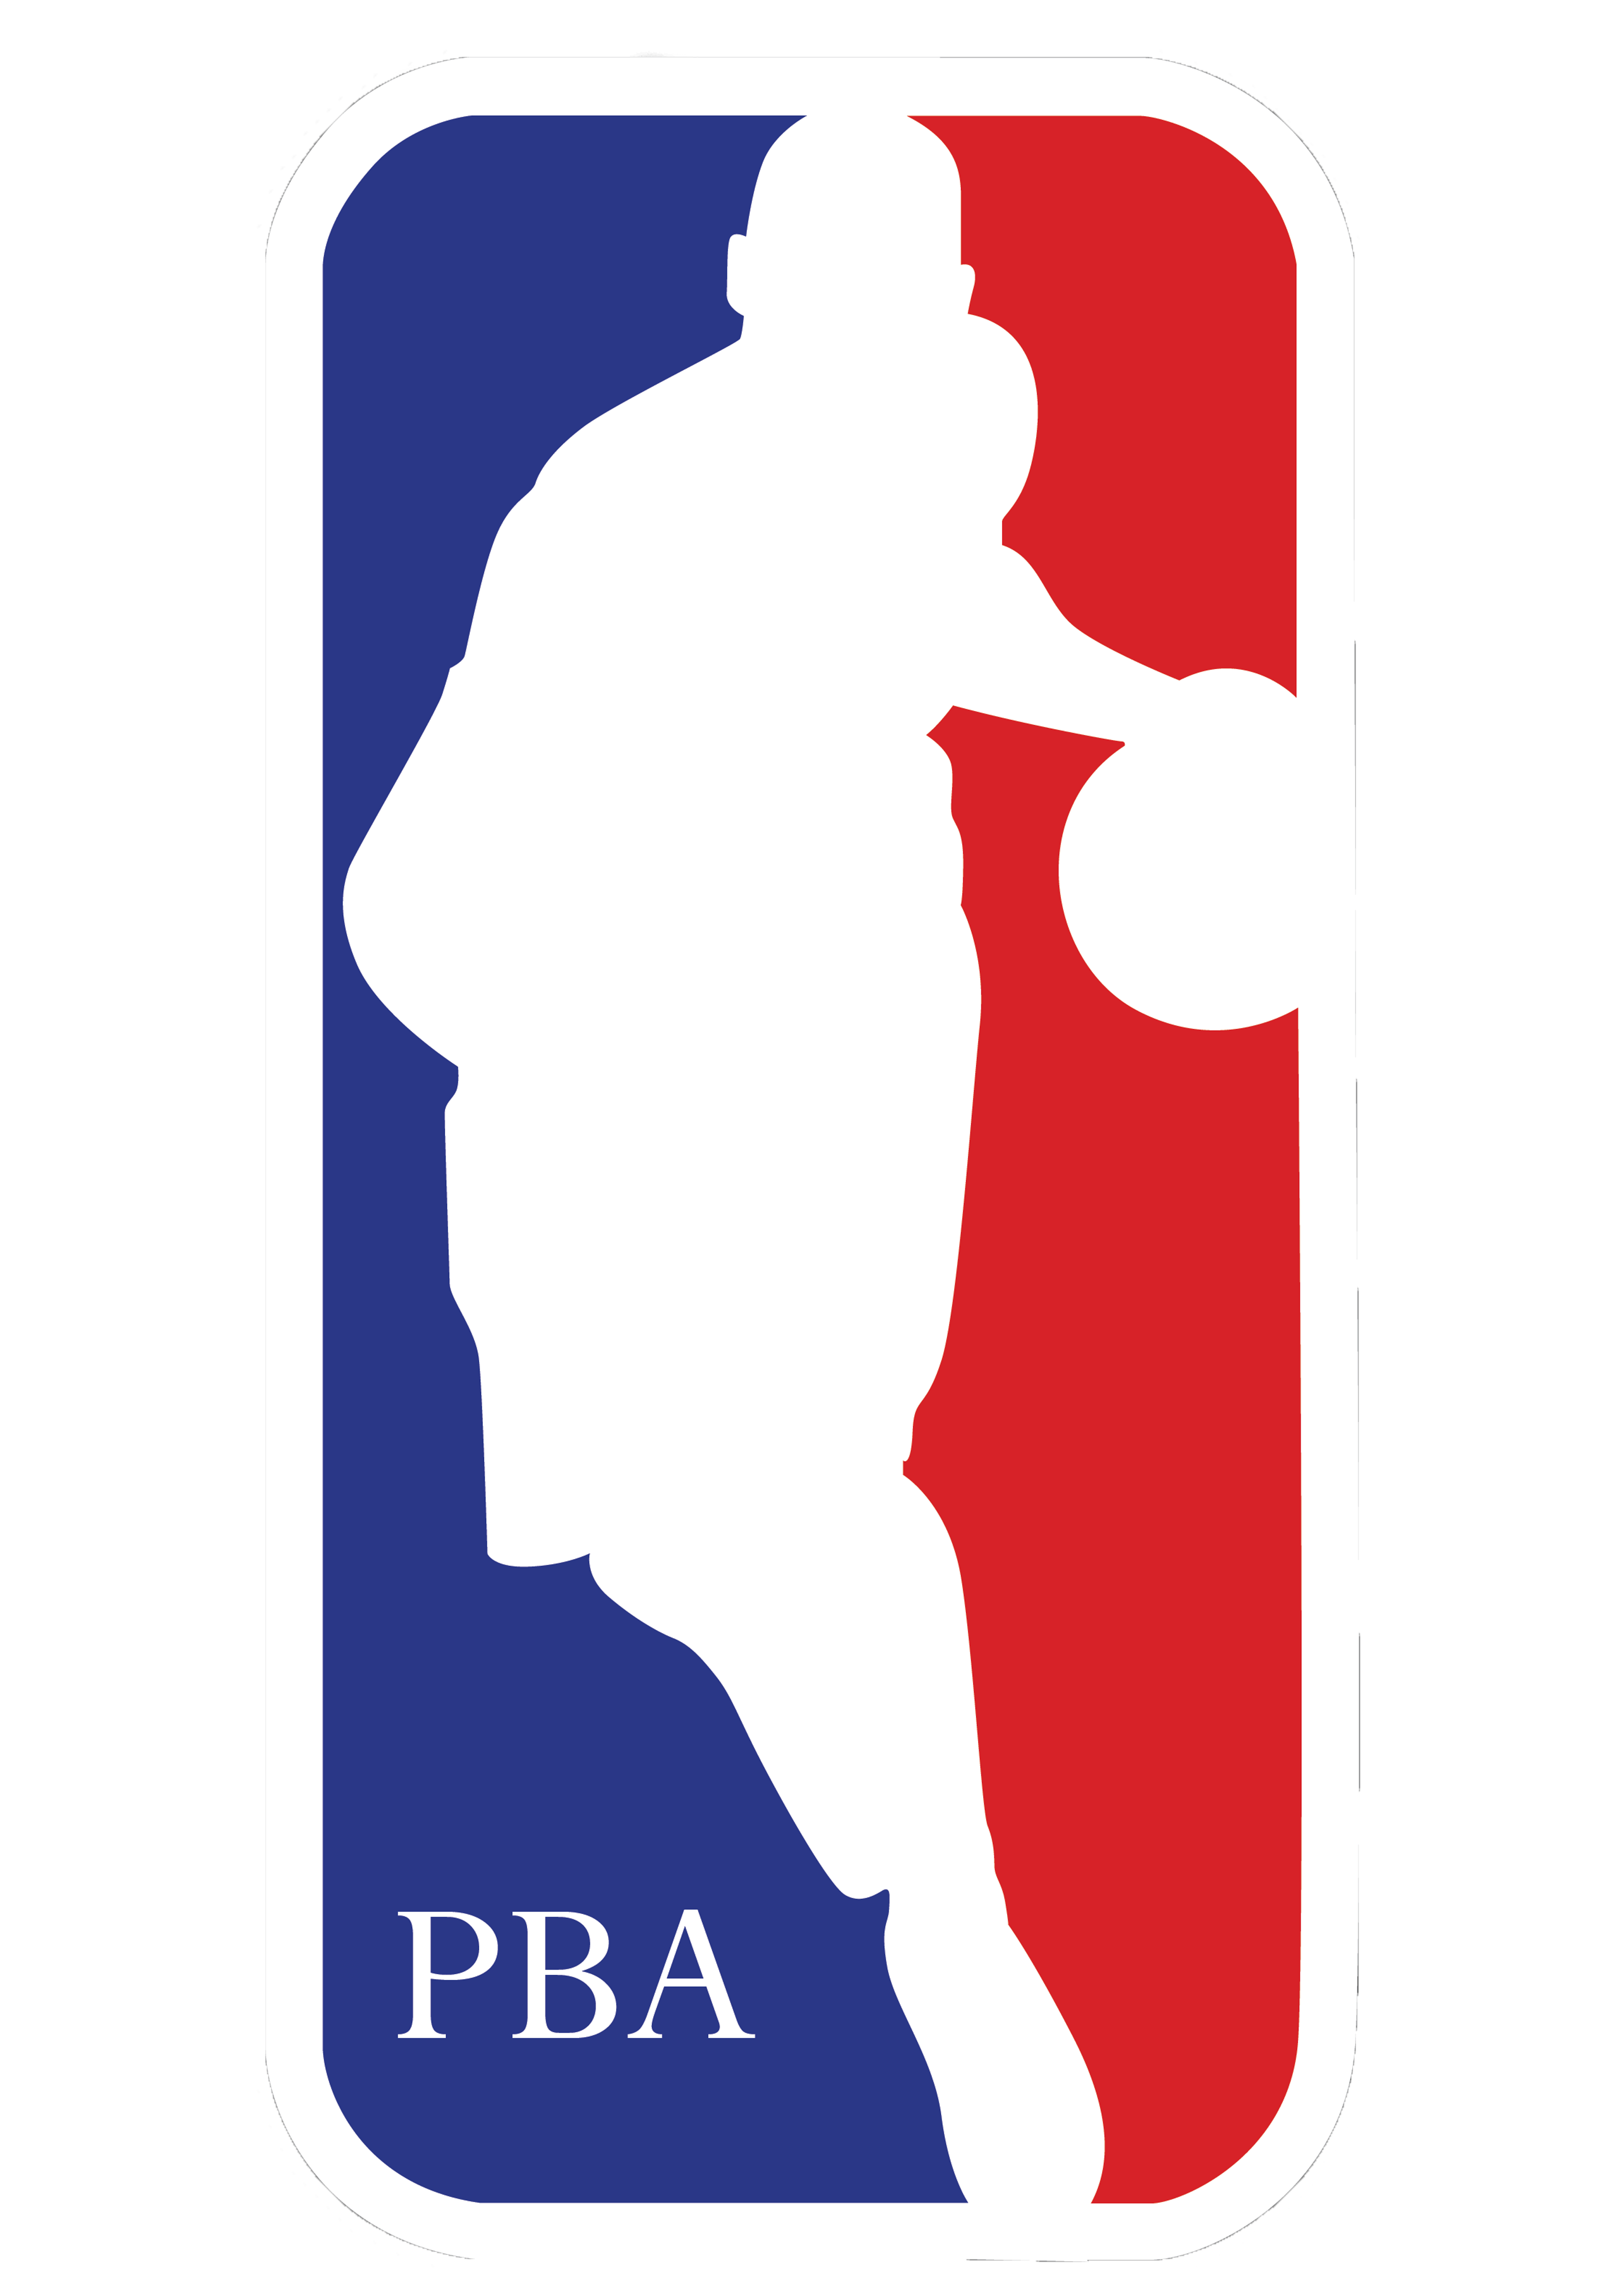 Pro Basketball Association LLC